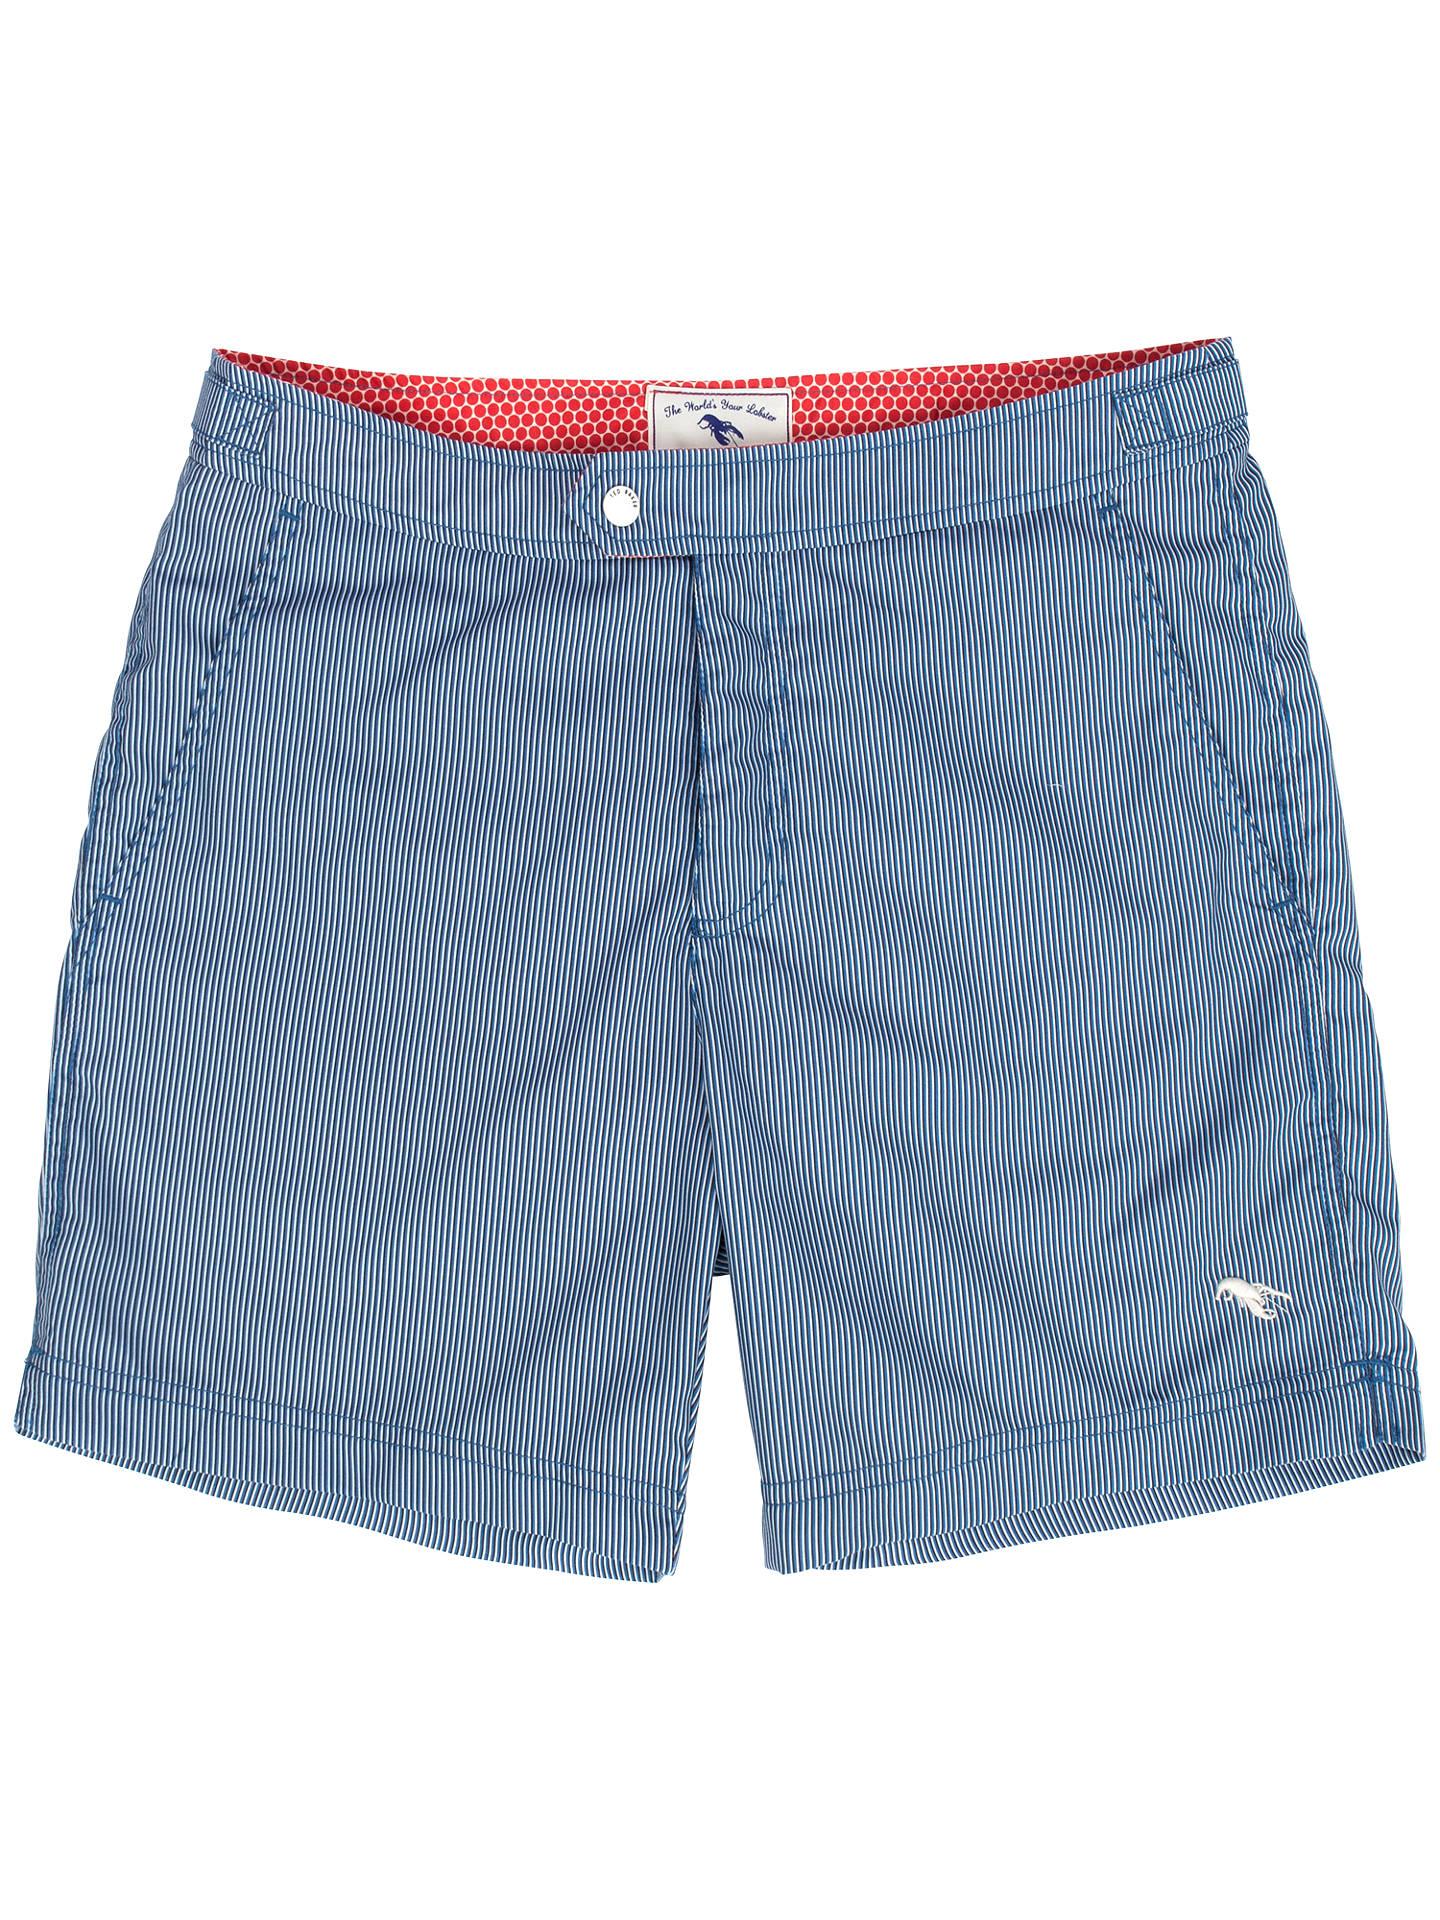 34d0bccada Buy Ted Baker T for Tall Rockfel Swim Shorts, Bright Blue, 4T Online at ...